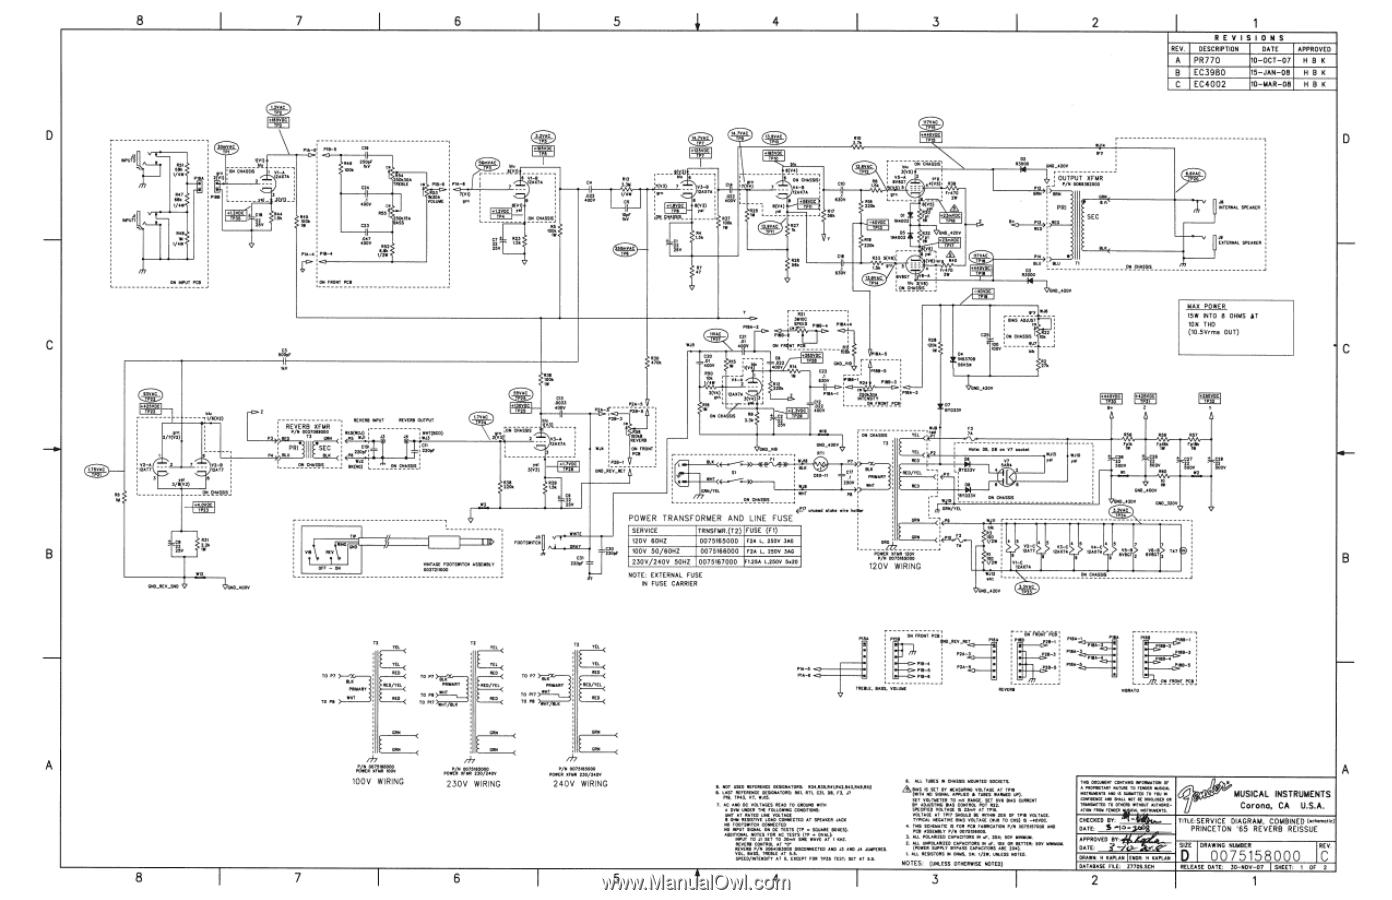 Fender 3965 Princeton Reverb | 65 Princeton Reverb Schematic on fender deluxe reverb tube layout, fender reverb amp, fender vibrolux schematic, fender super reverb, fender showman schematic, fender vibrato schematic, fender princeton schematic, fender tweed schematic, fender reverb amplifier, 300w amplifier schematic, fender tremolo schematic, fender pro reverb tube, fender reverb plan, fender vibrolux reverb, fender amplifier schematic, fender princeton reverb reissue, fender super amp, fender vibroverb schematic, tube overdrive schematic, fender bandmaster reverb,